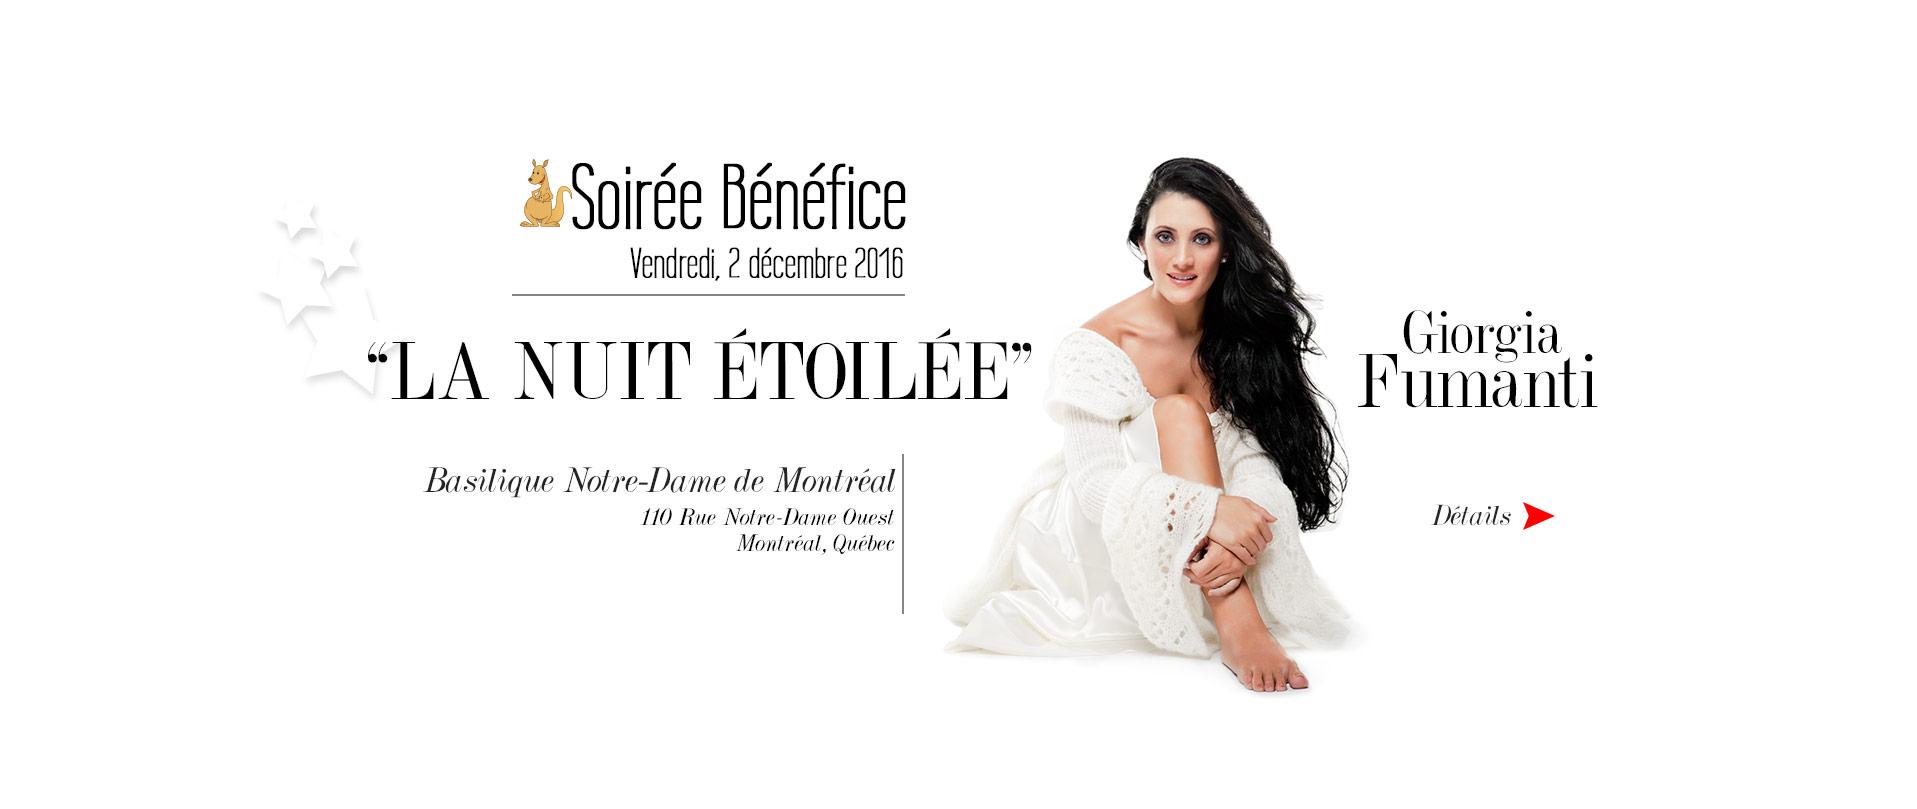 soiree-benifice